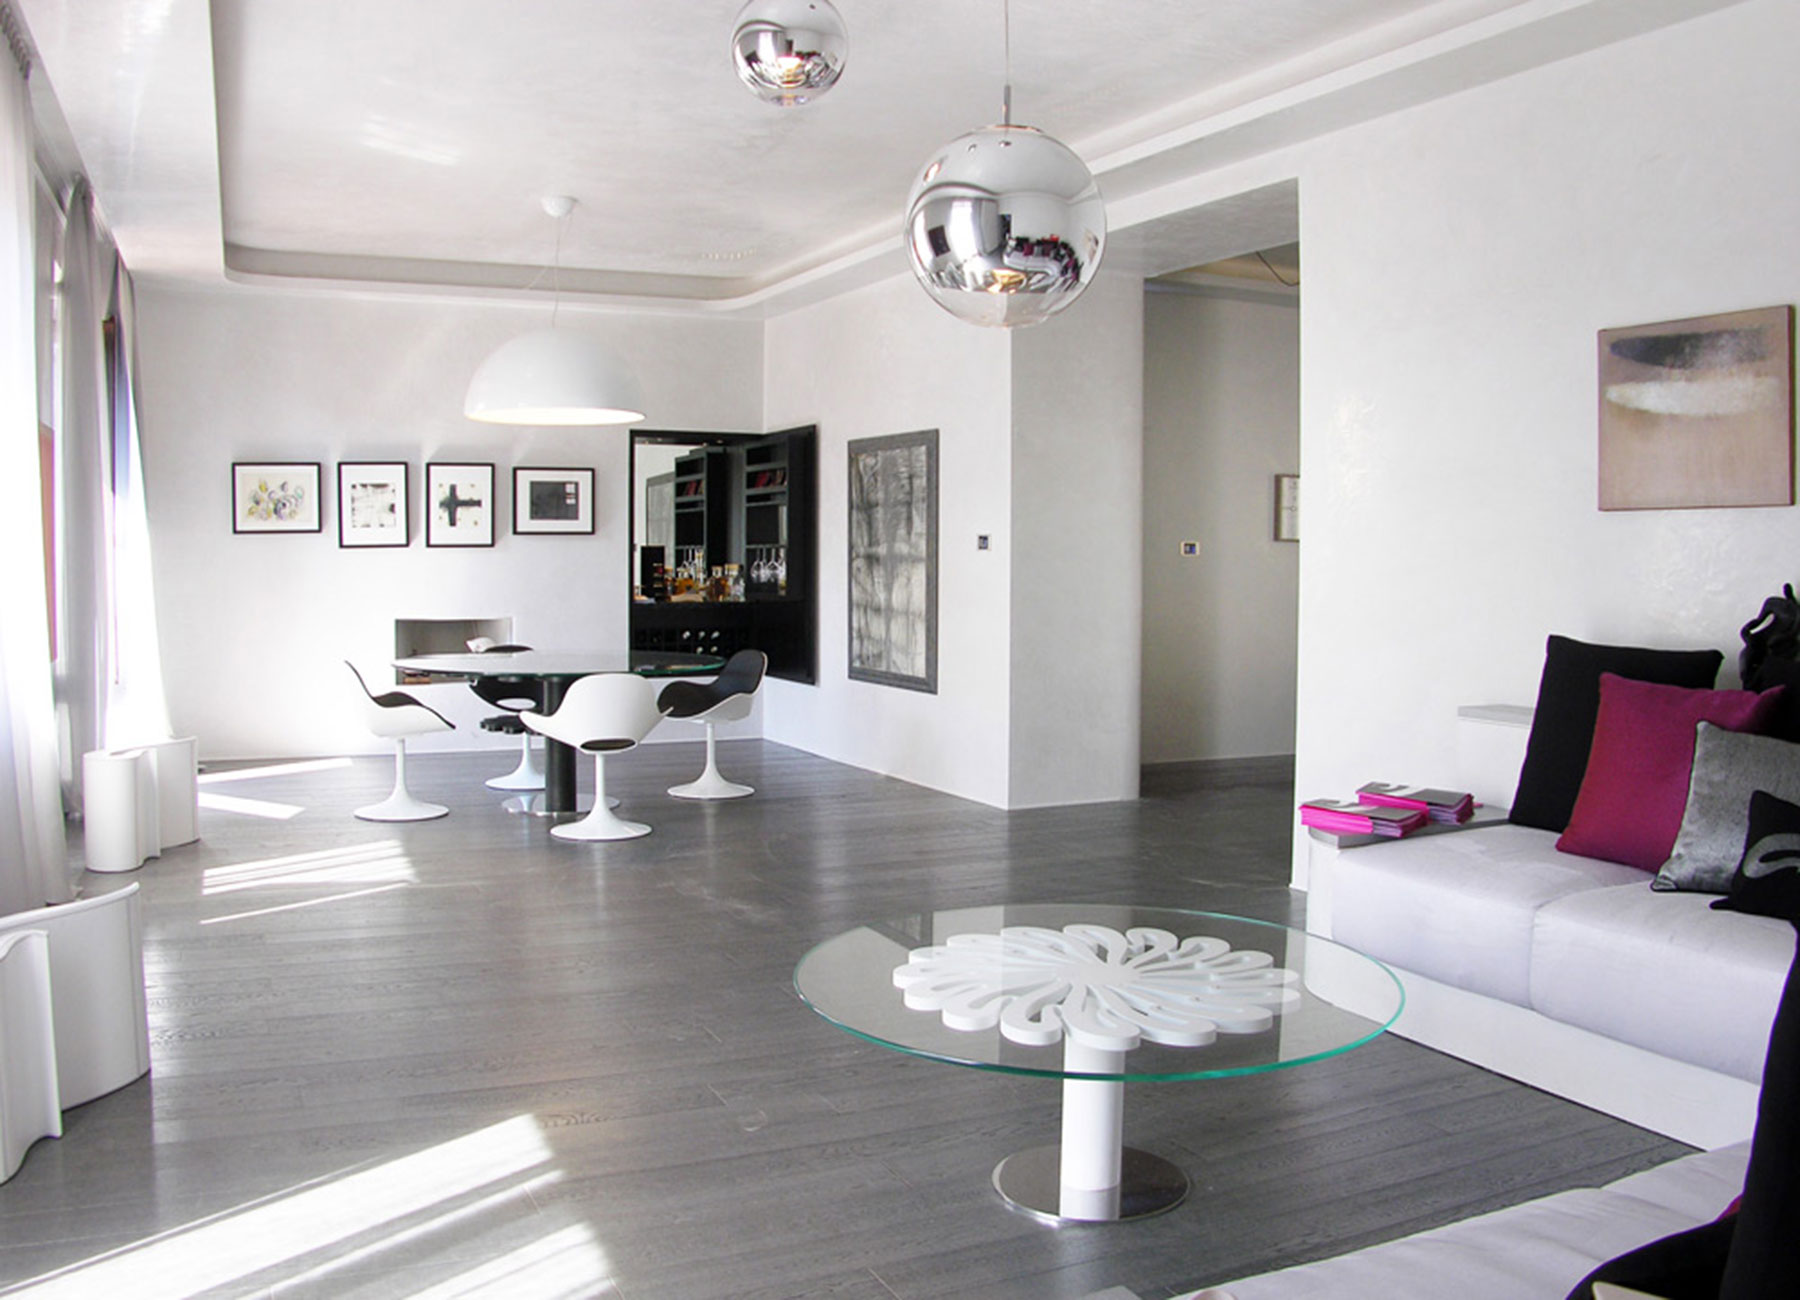 Italian Interior Design by Annabella Nassetti in Milan